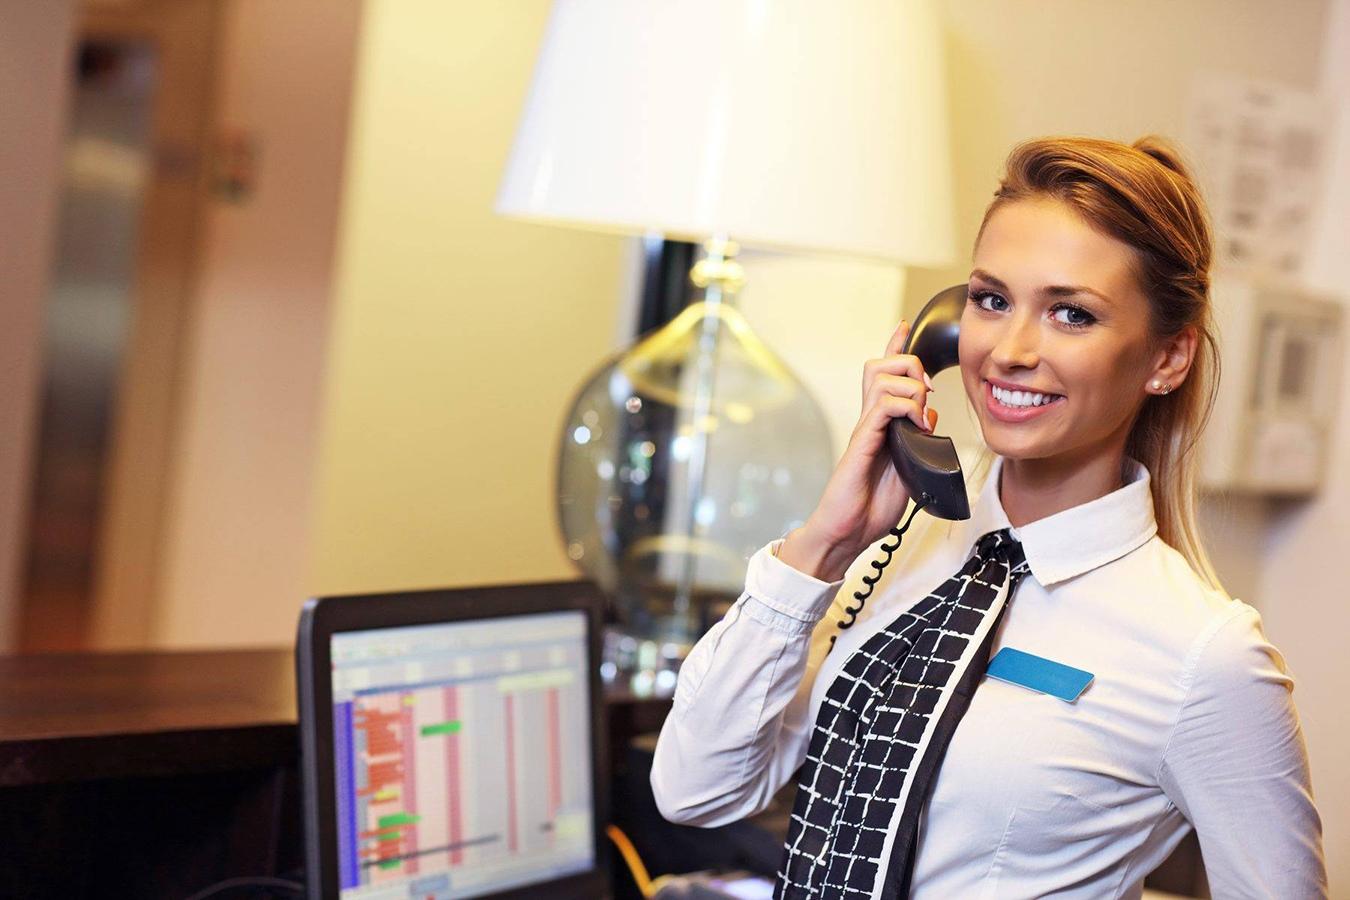 Девушка на ресепшен работа работа в красноярске вакансии для девушек